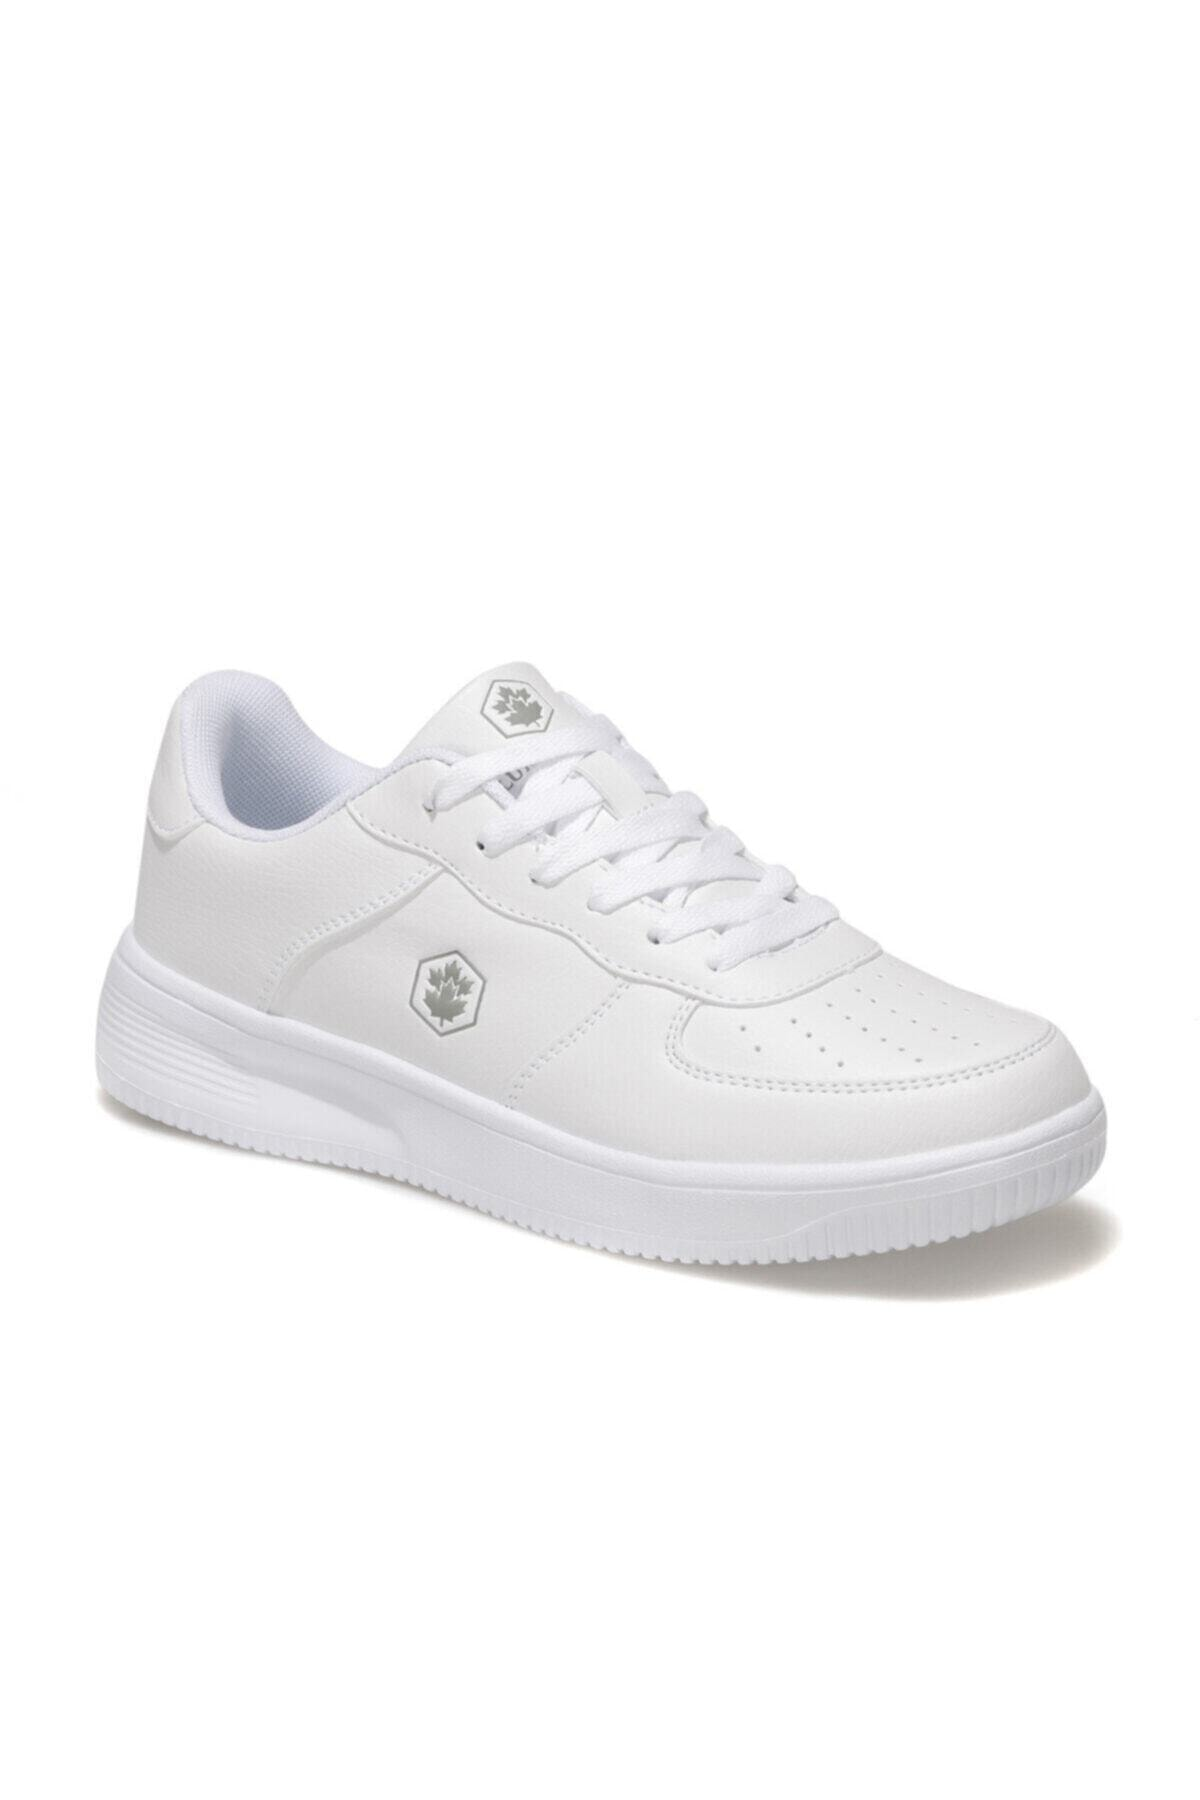 lumberjack FINSTER 1FX Beyaz Erkek Sneaker Ayakkabı 100784937 1